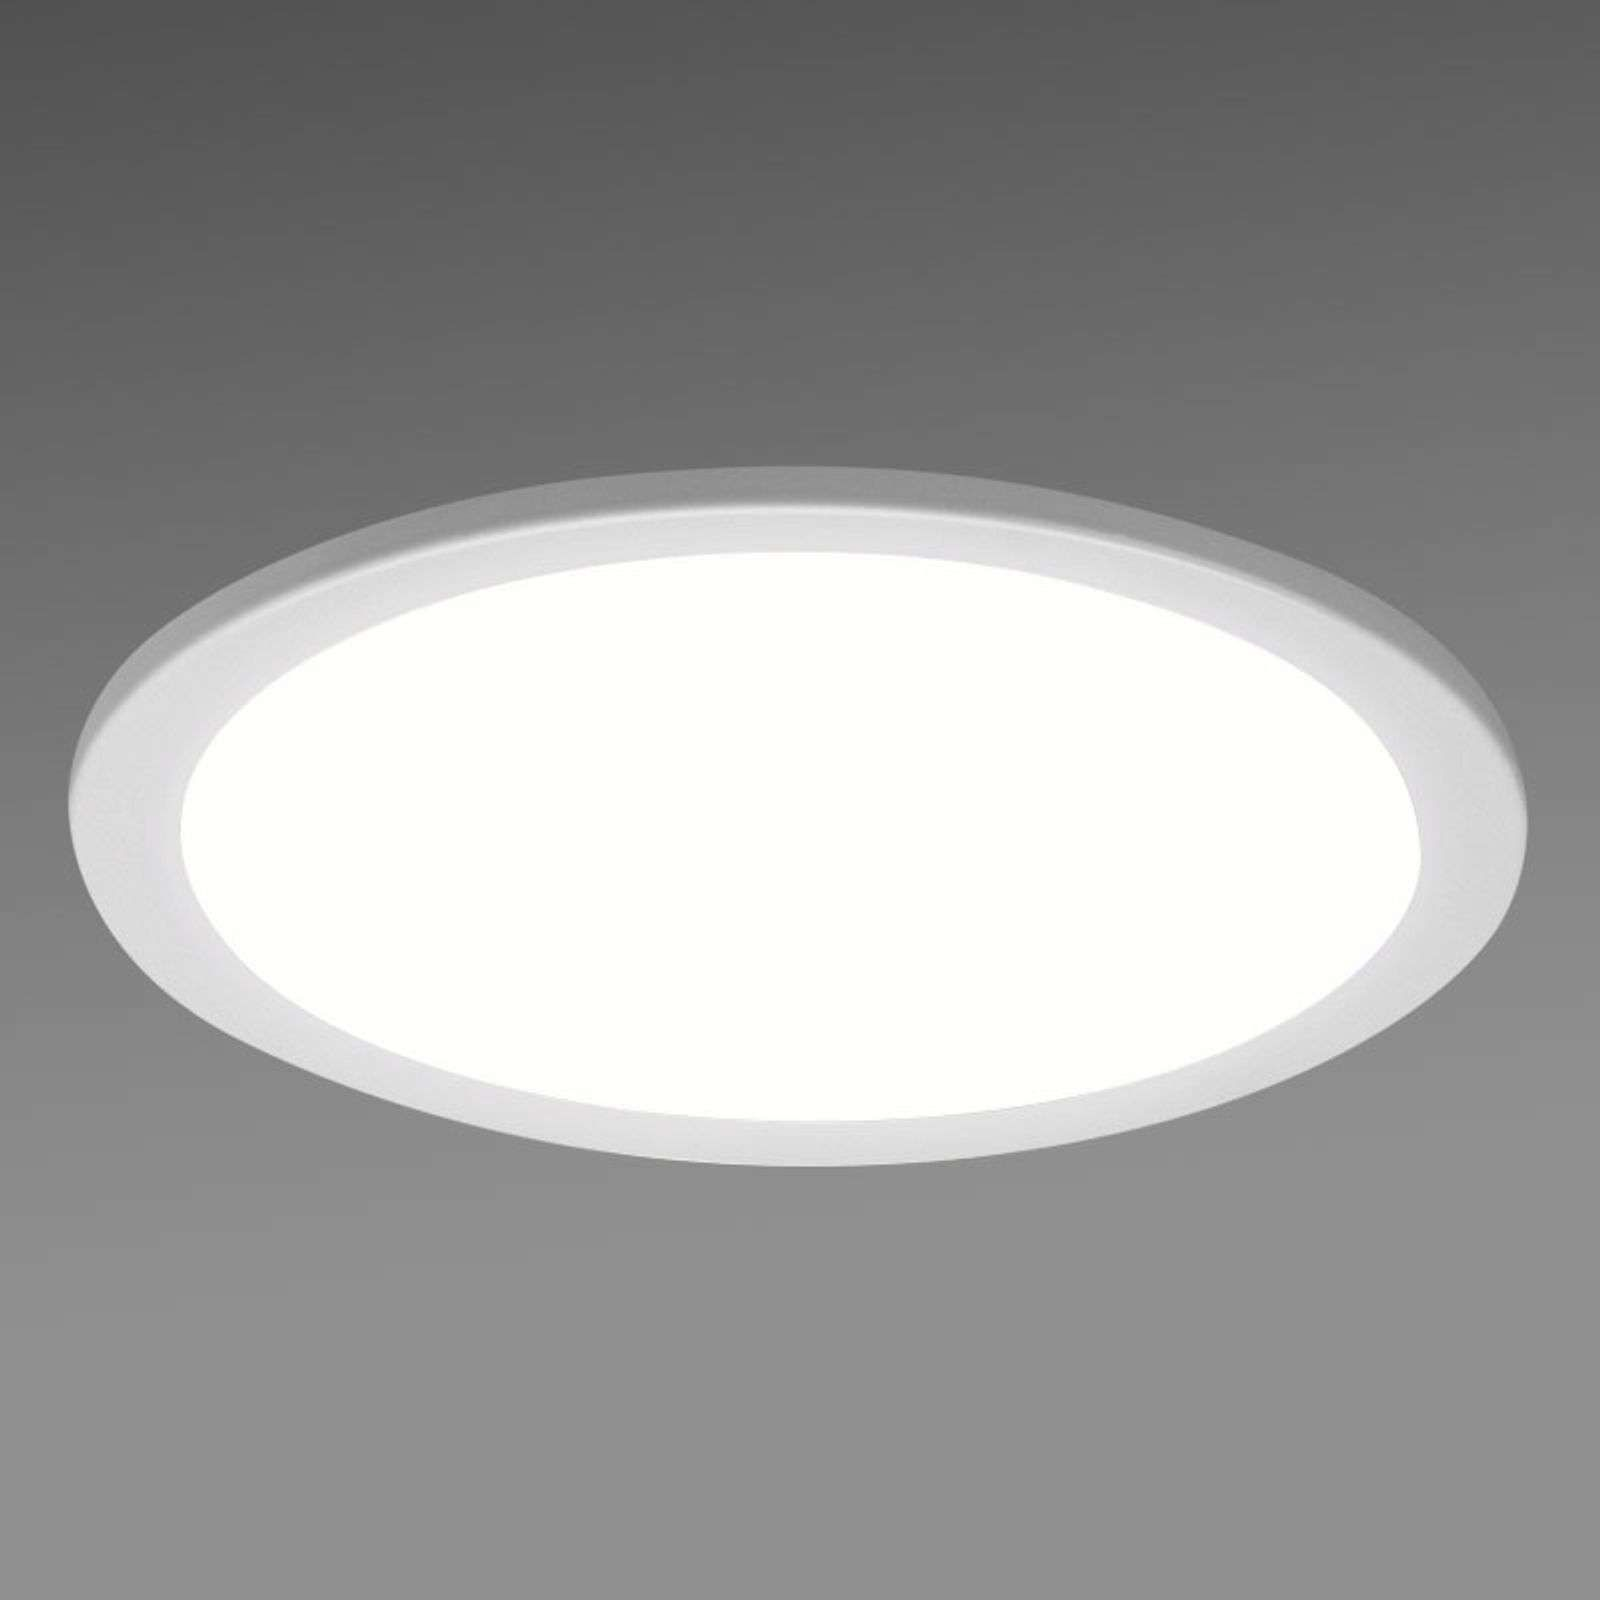 Rundes Led Einbaudownlight Sblg 4 000 K Led Spots Dimmbar Wandlampe Vintage Led